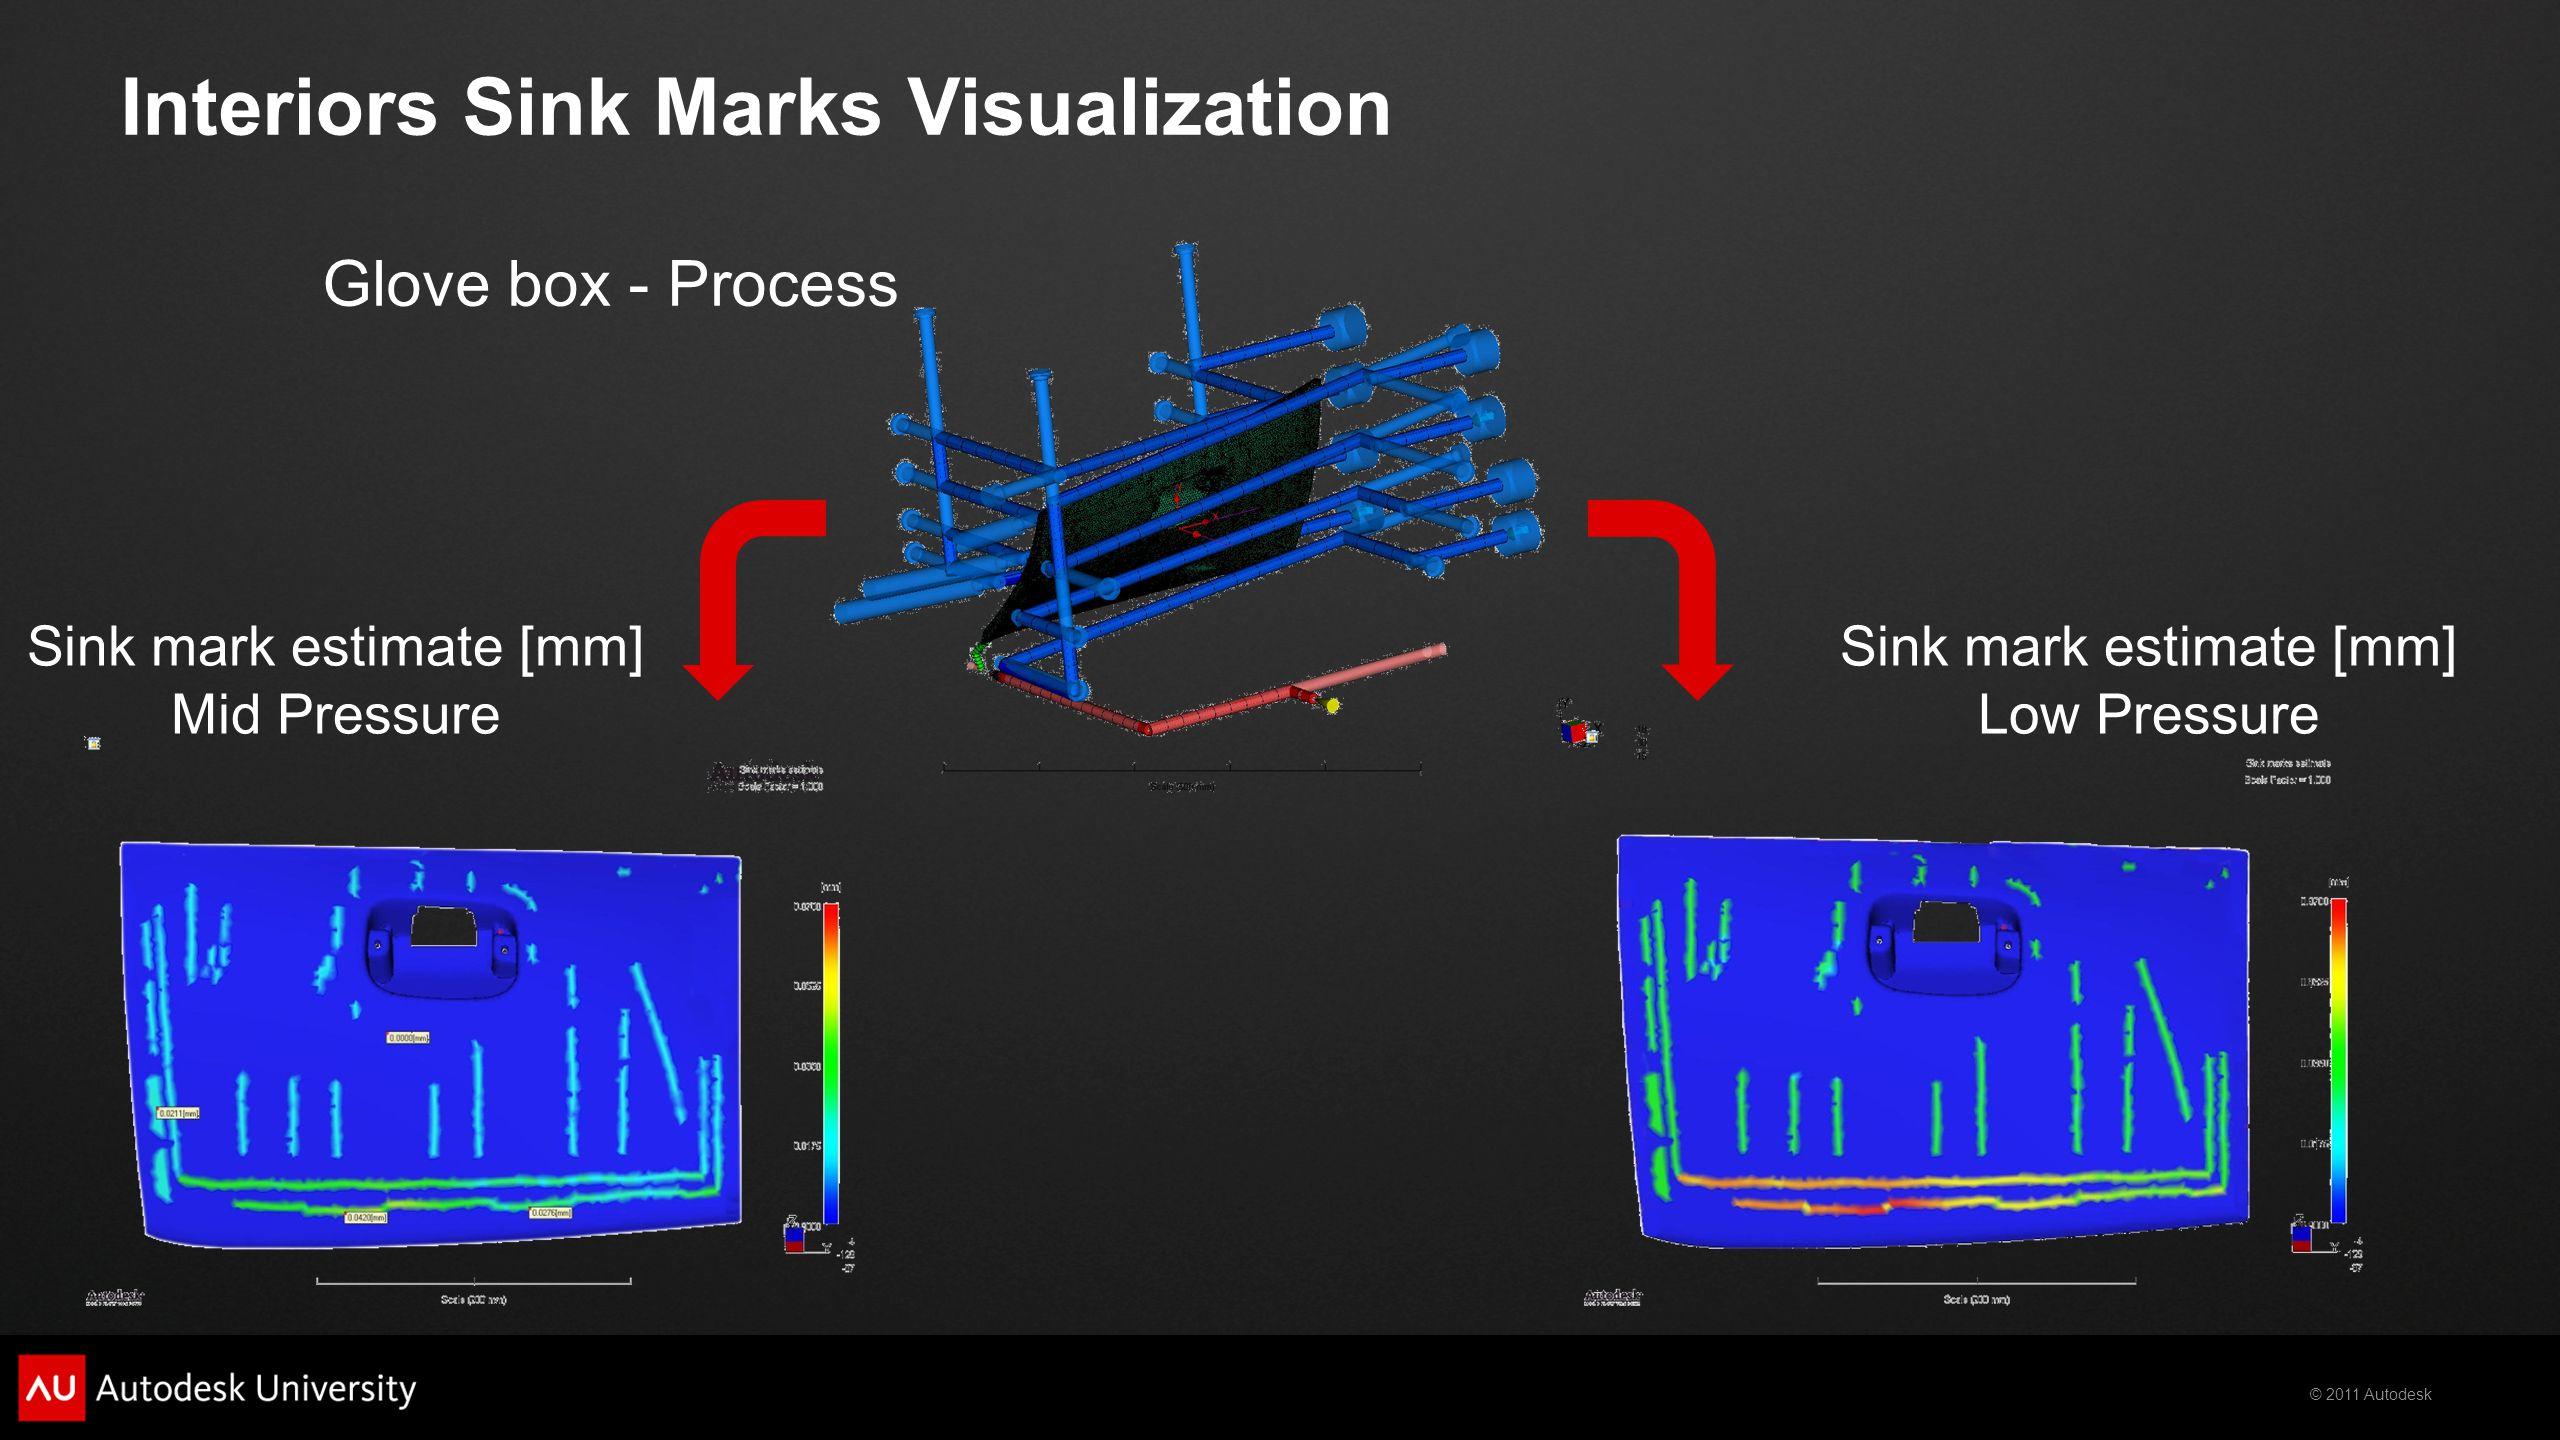 © 2011 Autodesk Glove box - Process Sink mark estimate [mm] Mid Pressure Sink mark estimate [mm] Low Pressure Interiors Sink Marks Visualization